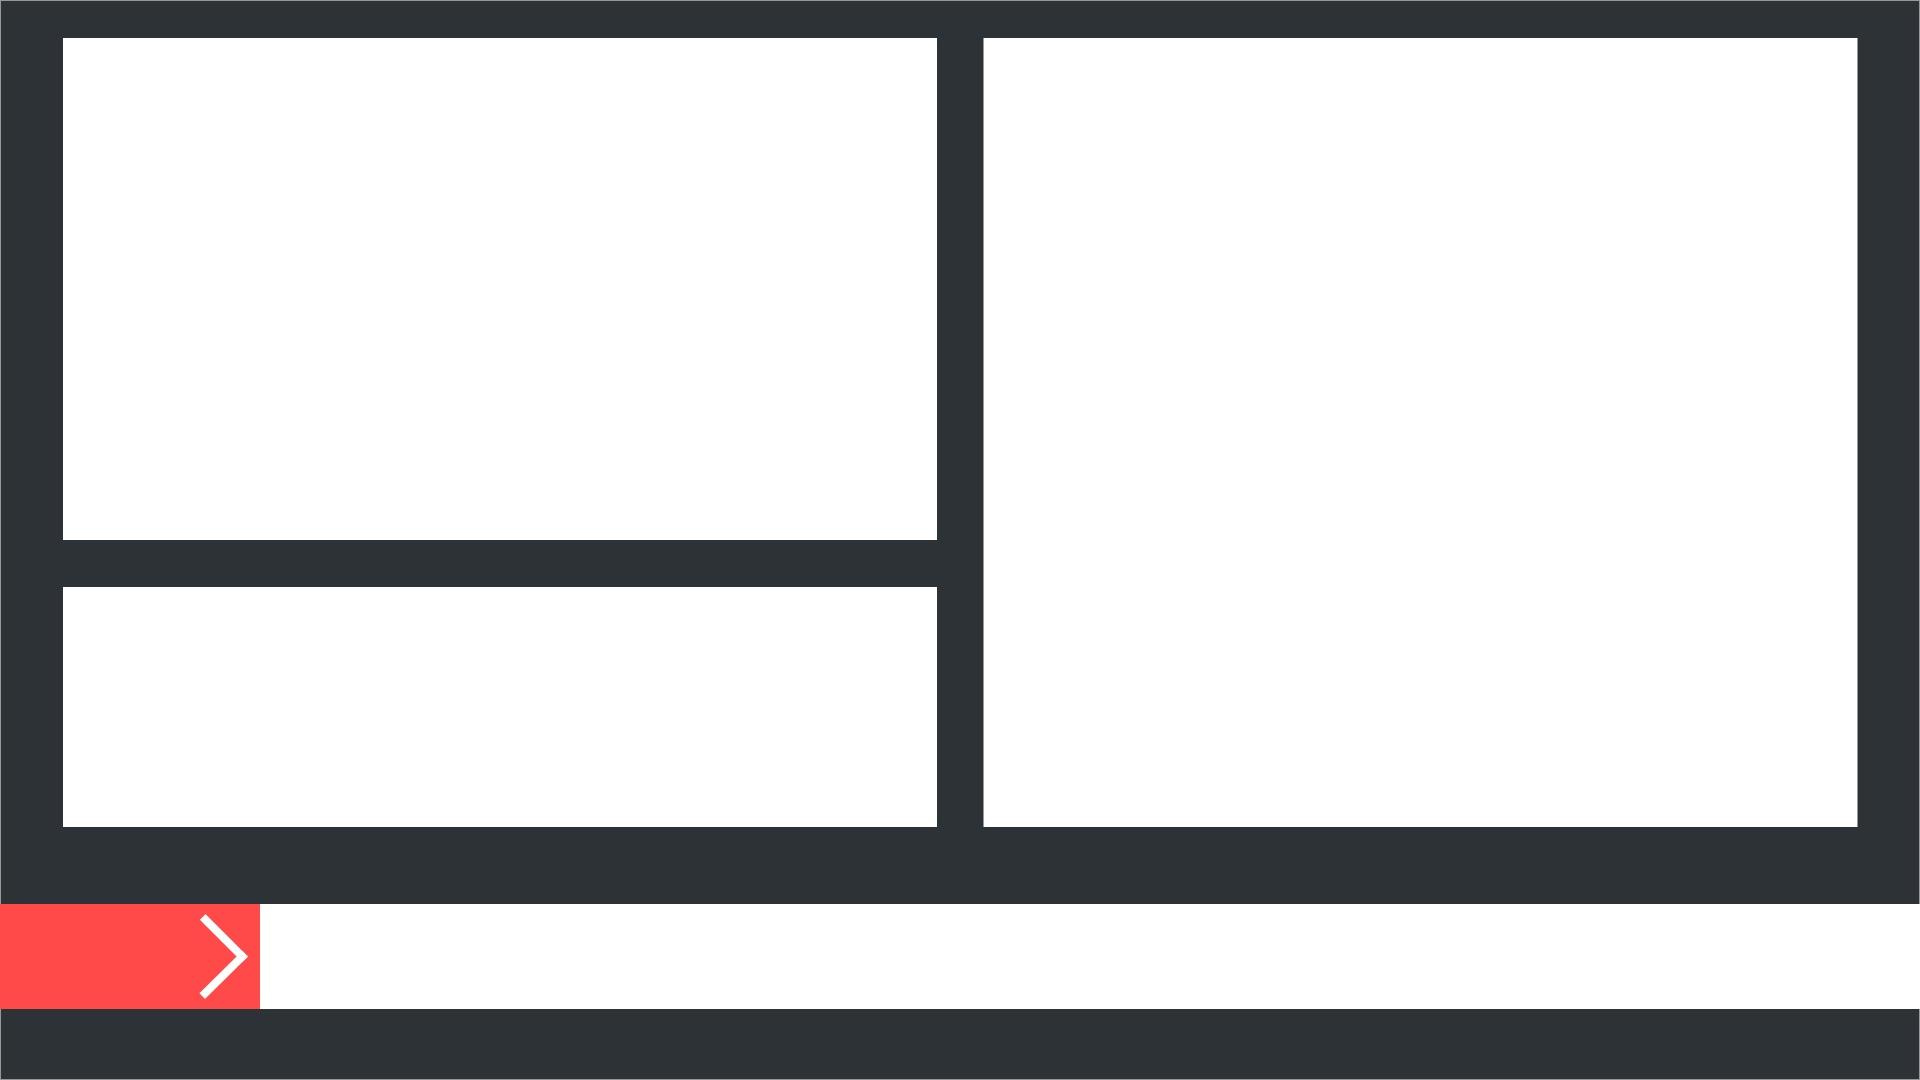 A digital signage background layout